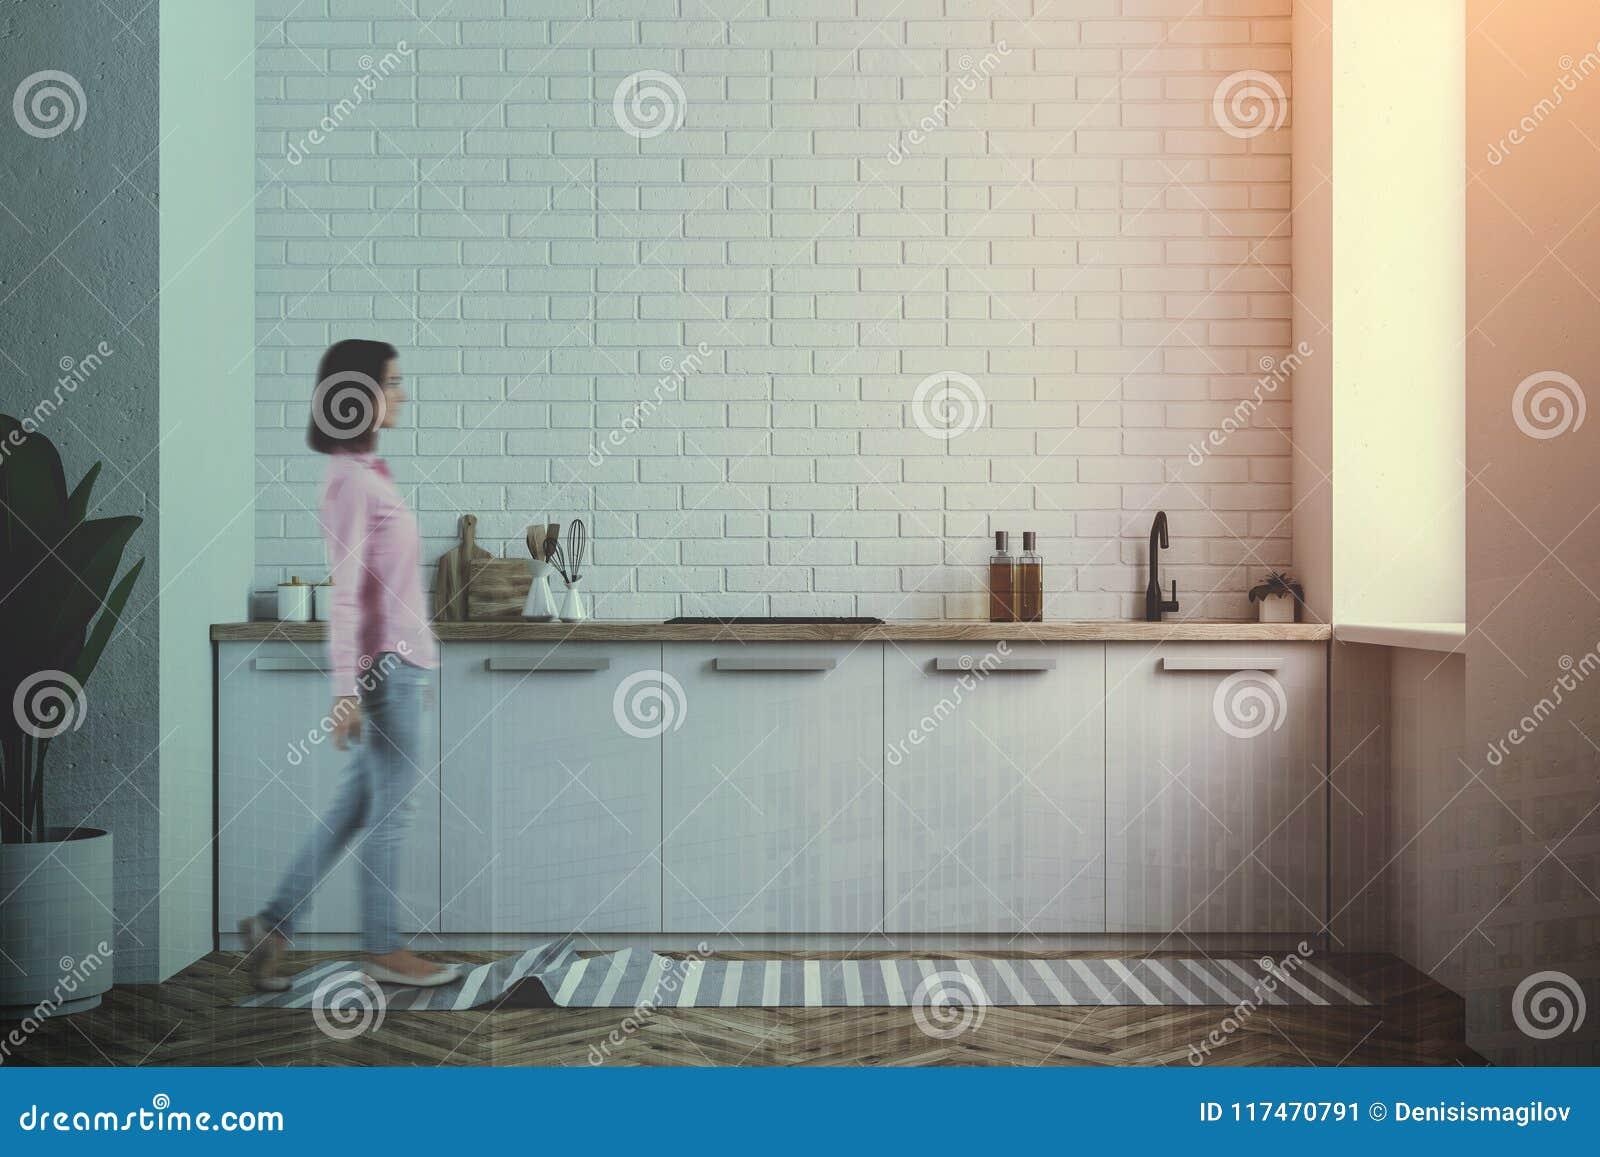 White Kitchen Counter, White Brick Wall Toned Stock Image - Image of ...